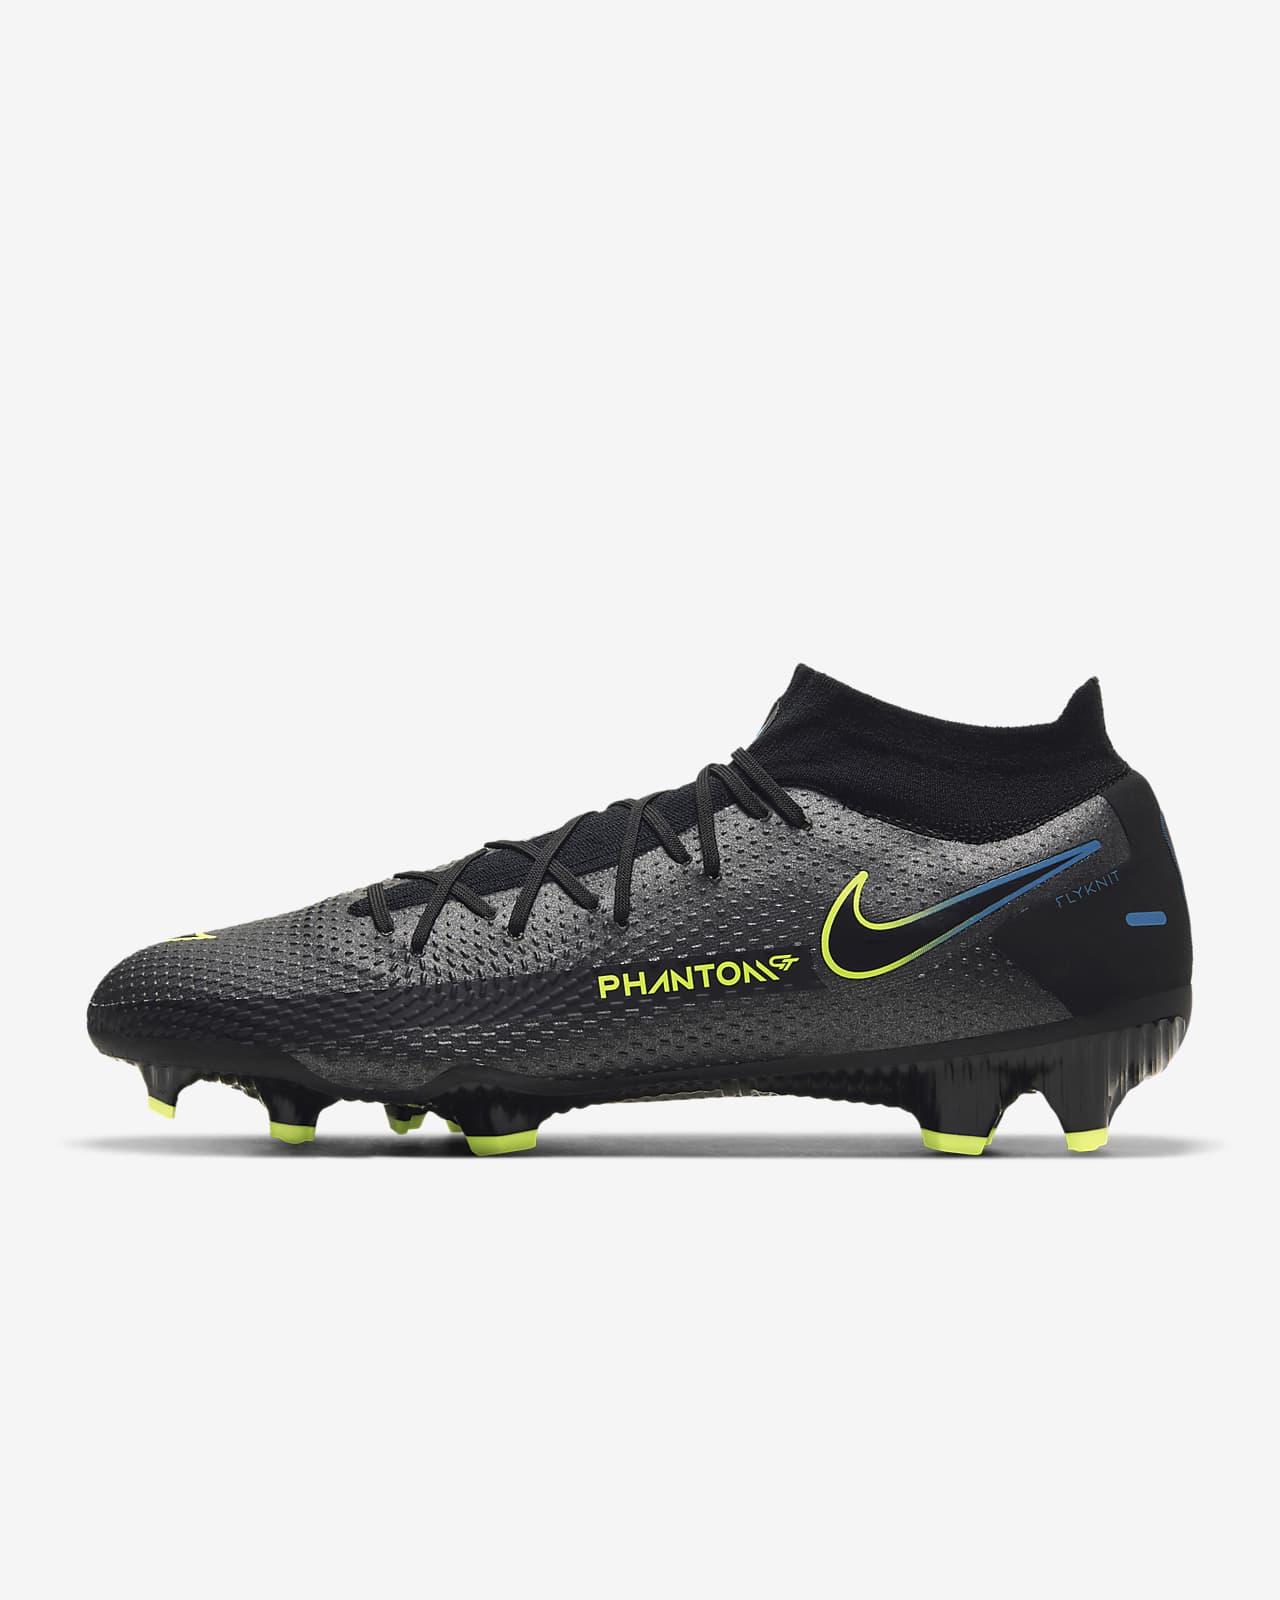 Nike Phantom GT Pro Dynamic Fit FG Firm-Ground Football Boot